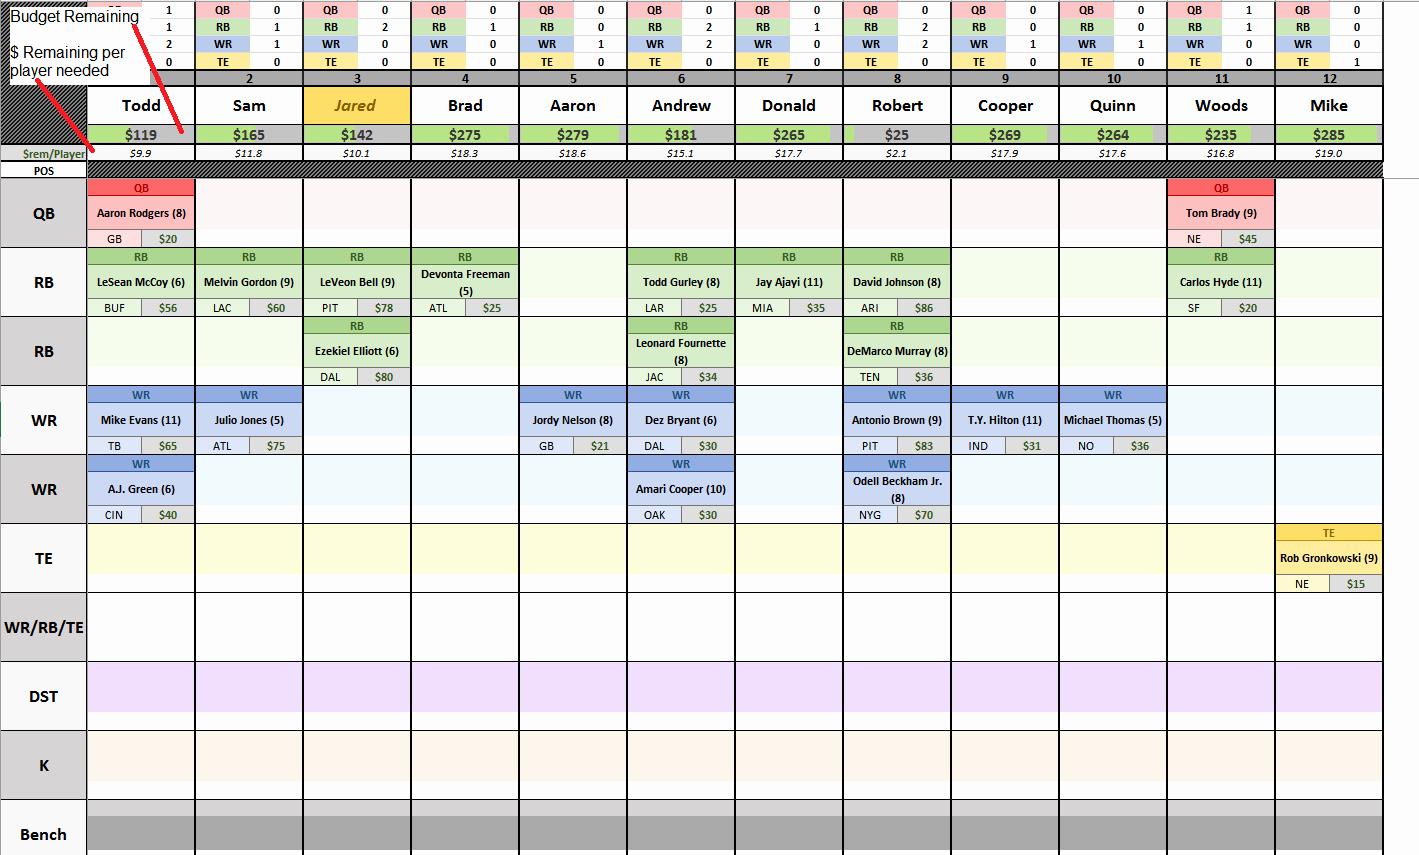 Fantasy Football Spreadsheet Template Beautiful Csg Fantasy Football Spreadsheet V5 02 Fantasyfootball